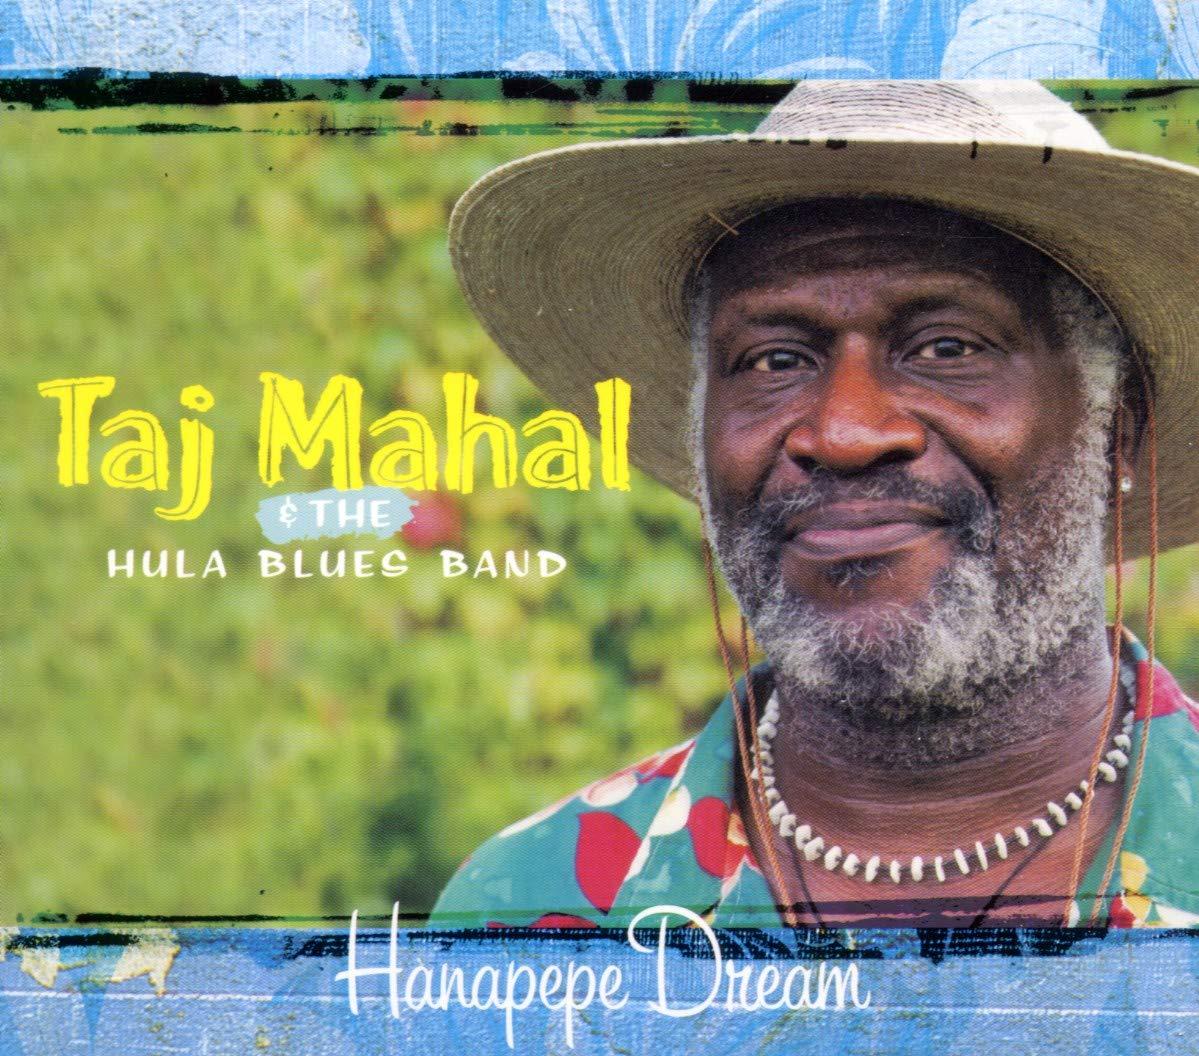 Taj Mahal & The Hula Blues Band - Hanapepe Dream (2001) [FLAC] Download